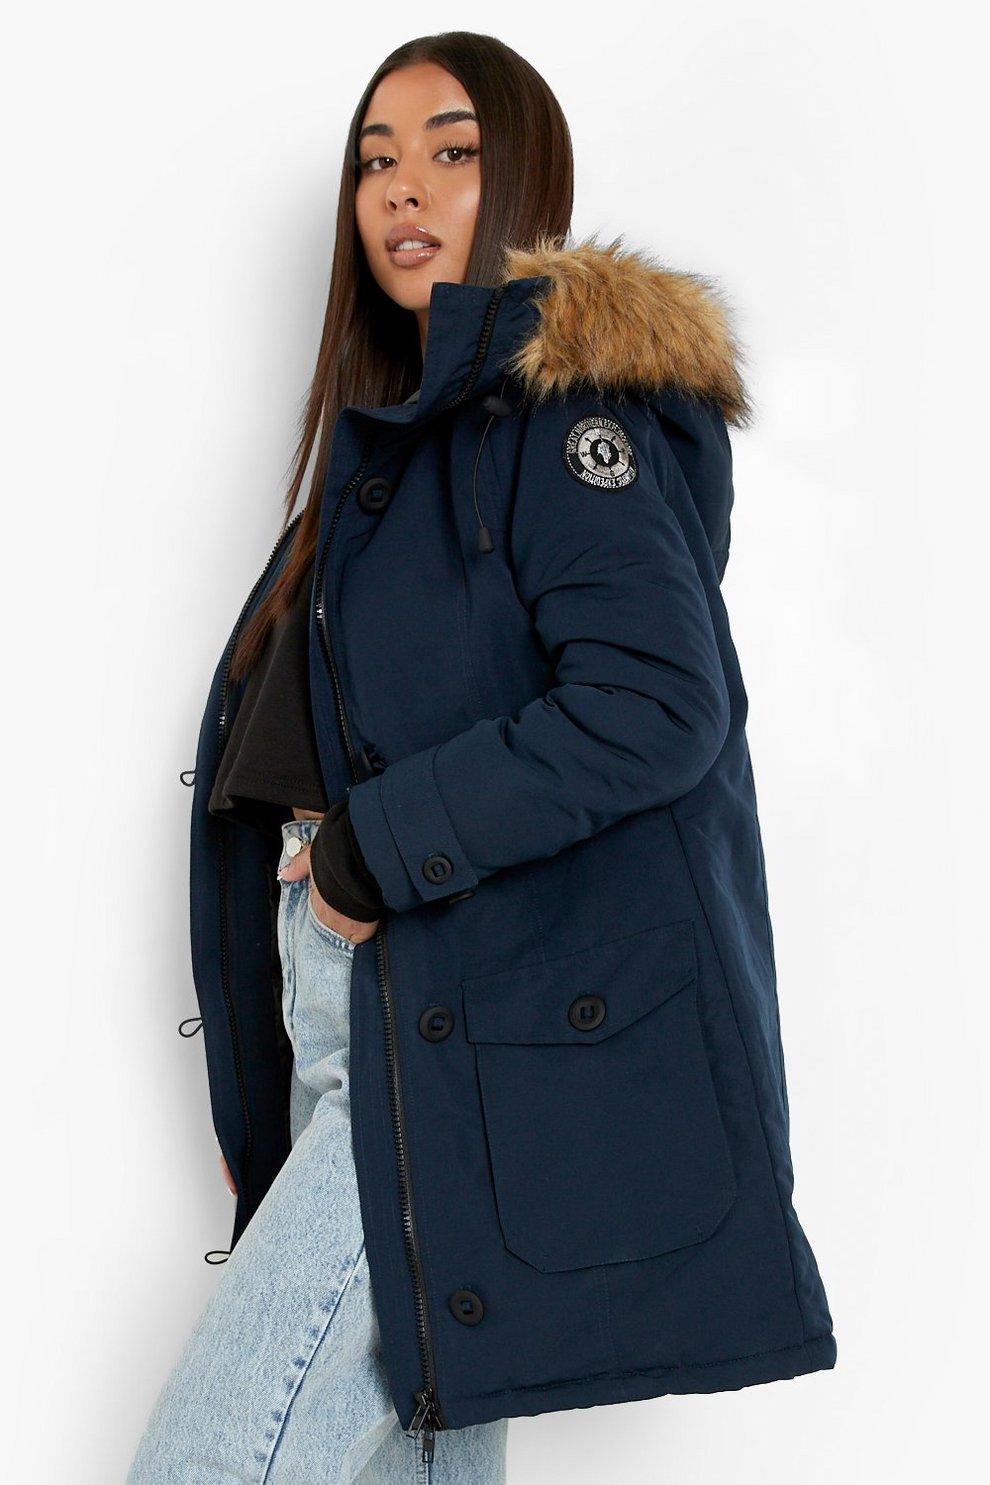 Faux Fur Trim Hooded Padded Jacket Boohoo